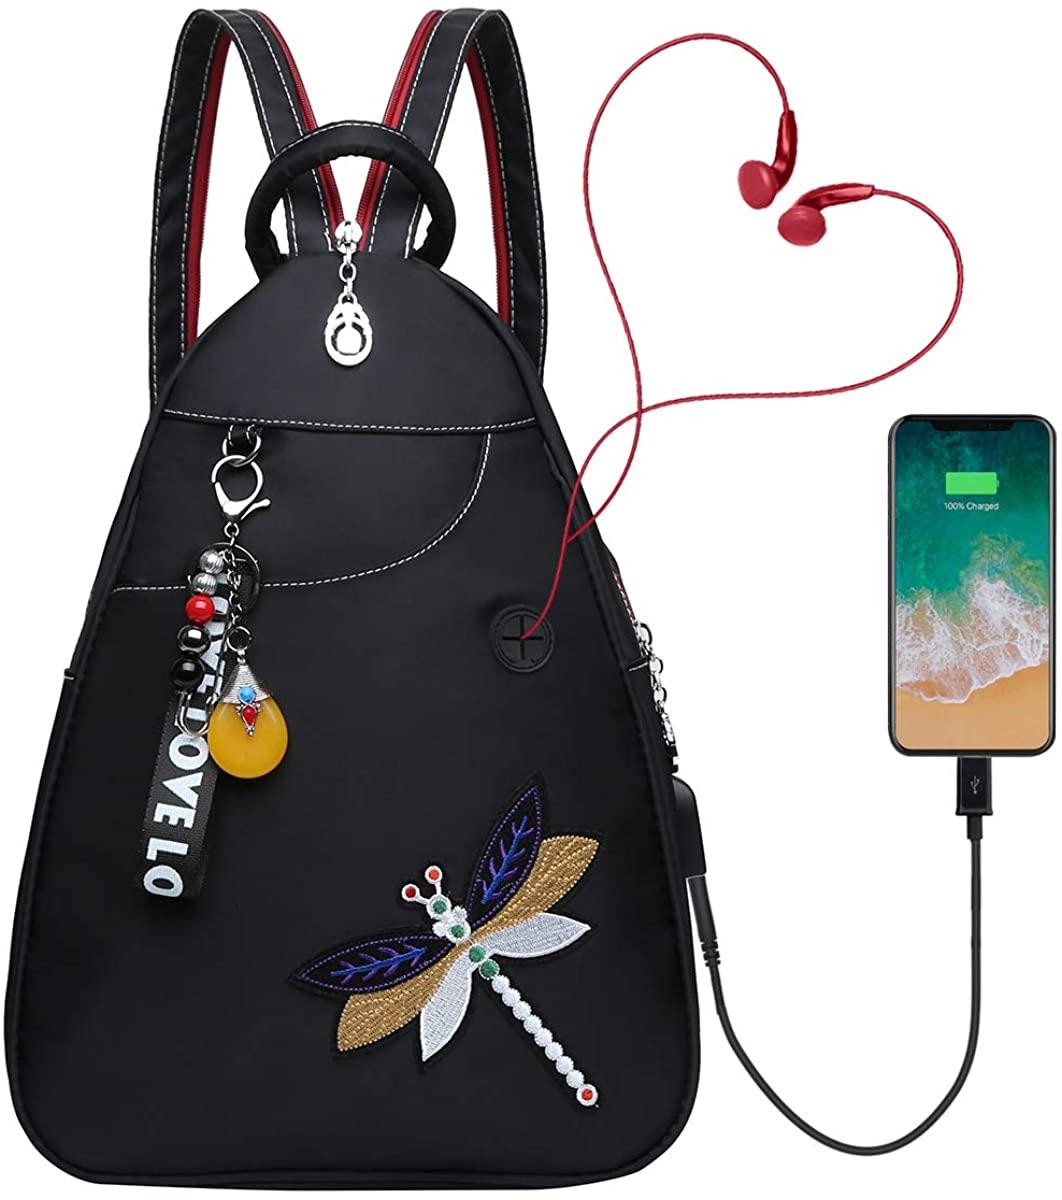 Eshow Women's Ladies Oxford Handbag Shoulder Bag Casual Backpack Hobo Daily Purse Shopper Tote Large Capacity Bags (black-3209)